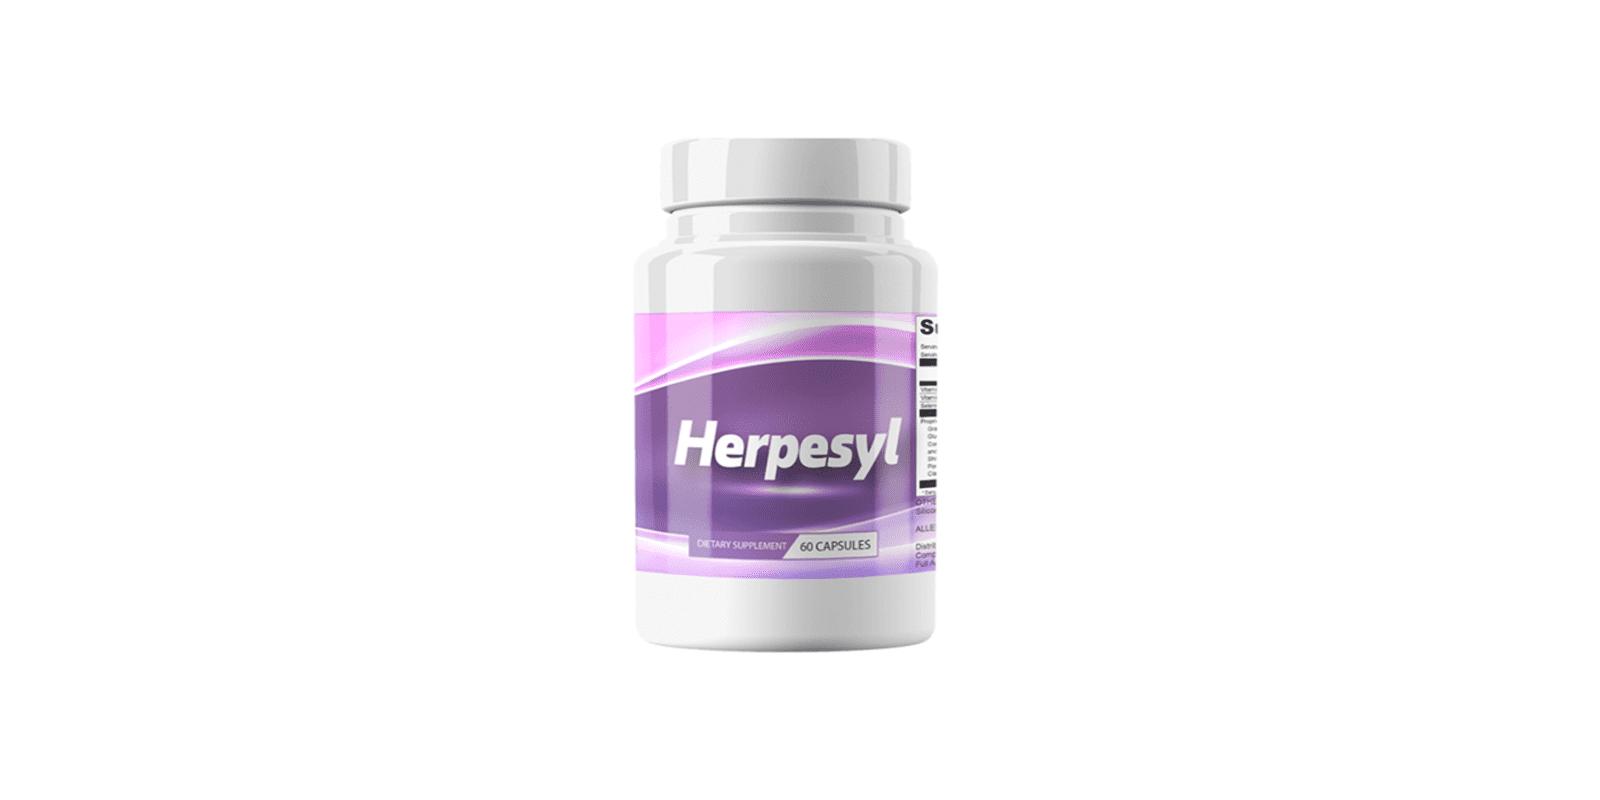 Herpesyl-Reviews